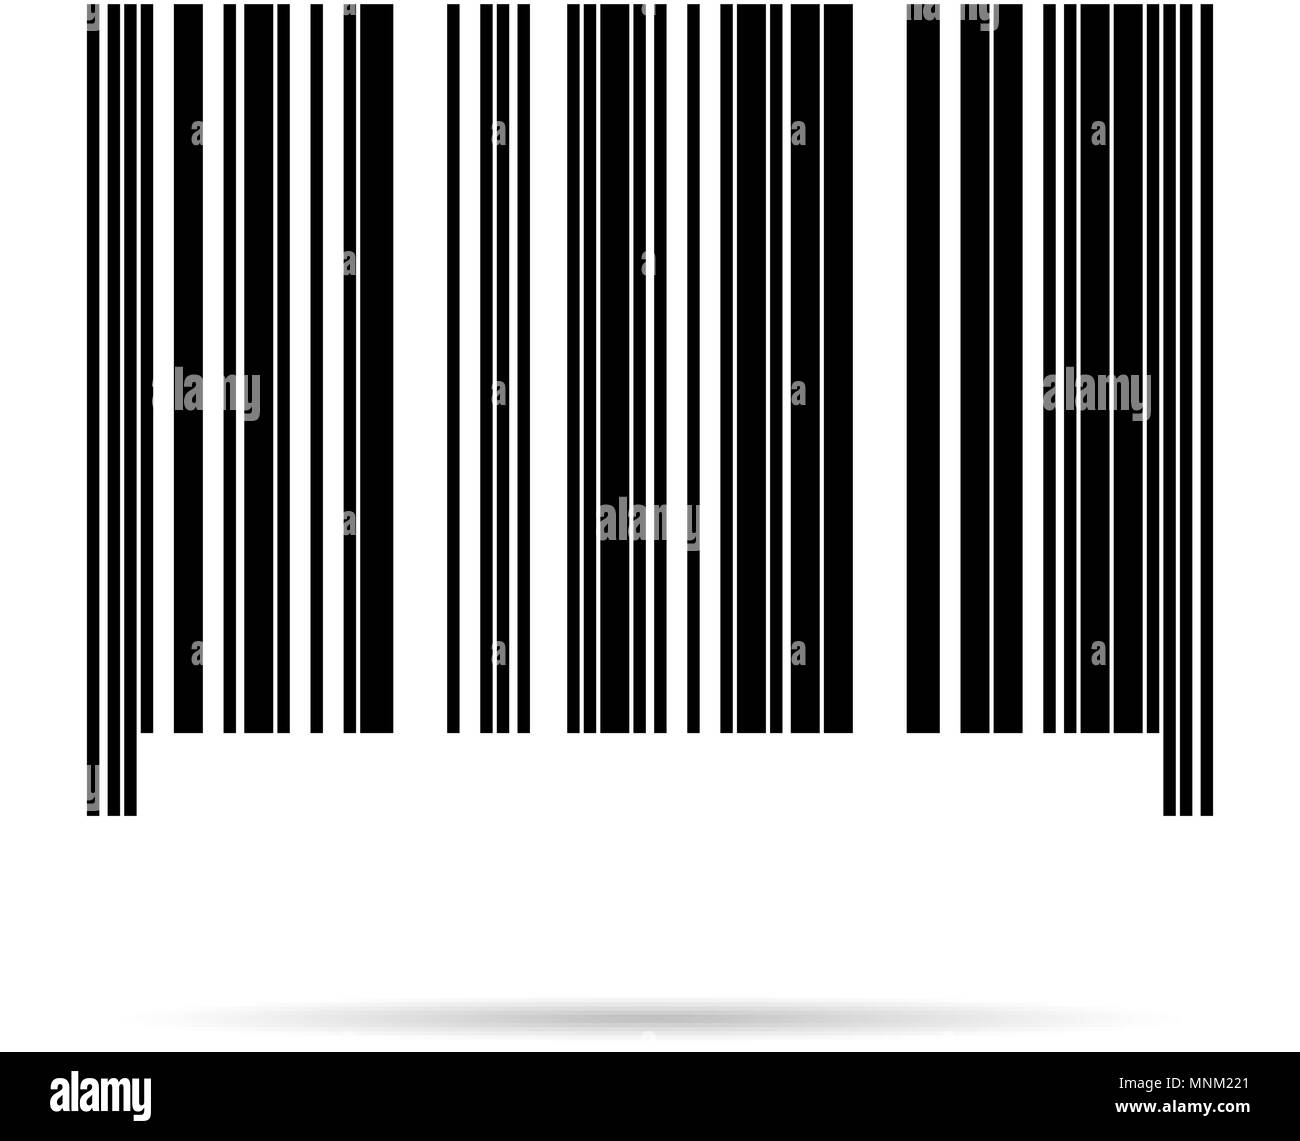 Upc Code Stockfotos & Upc Code Bilder - Seite 2 - Alamy